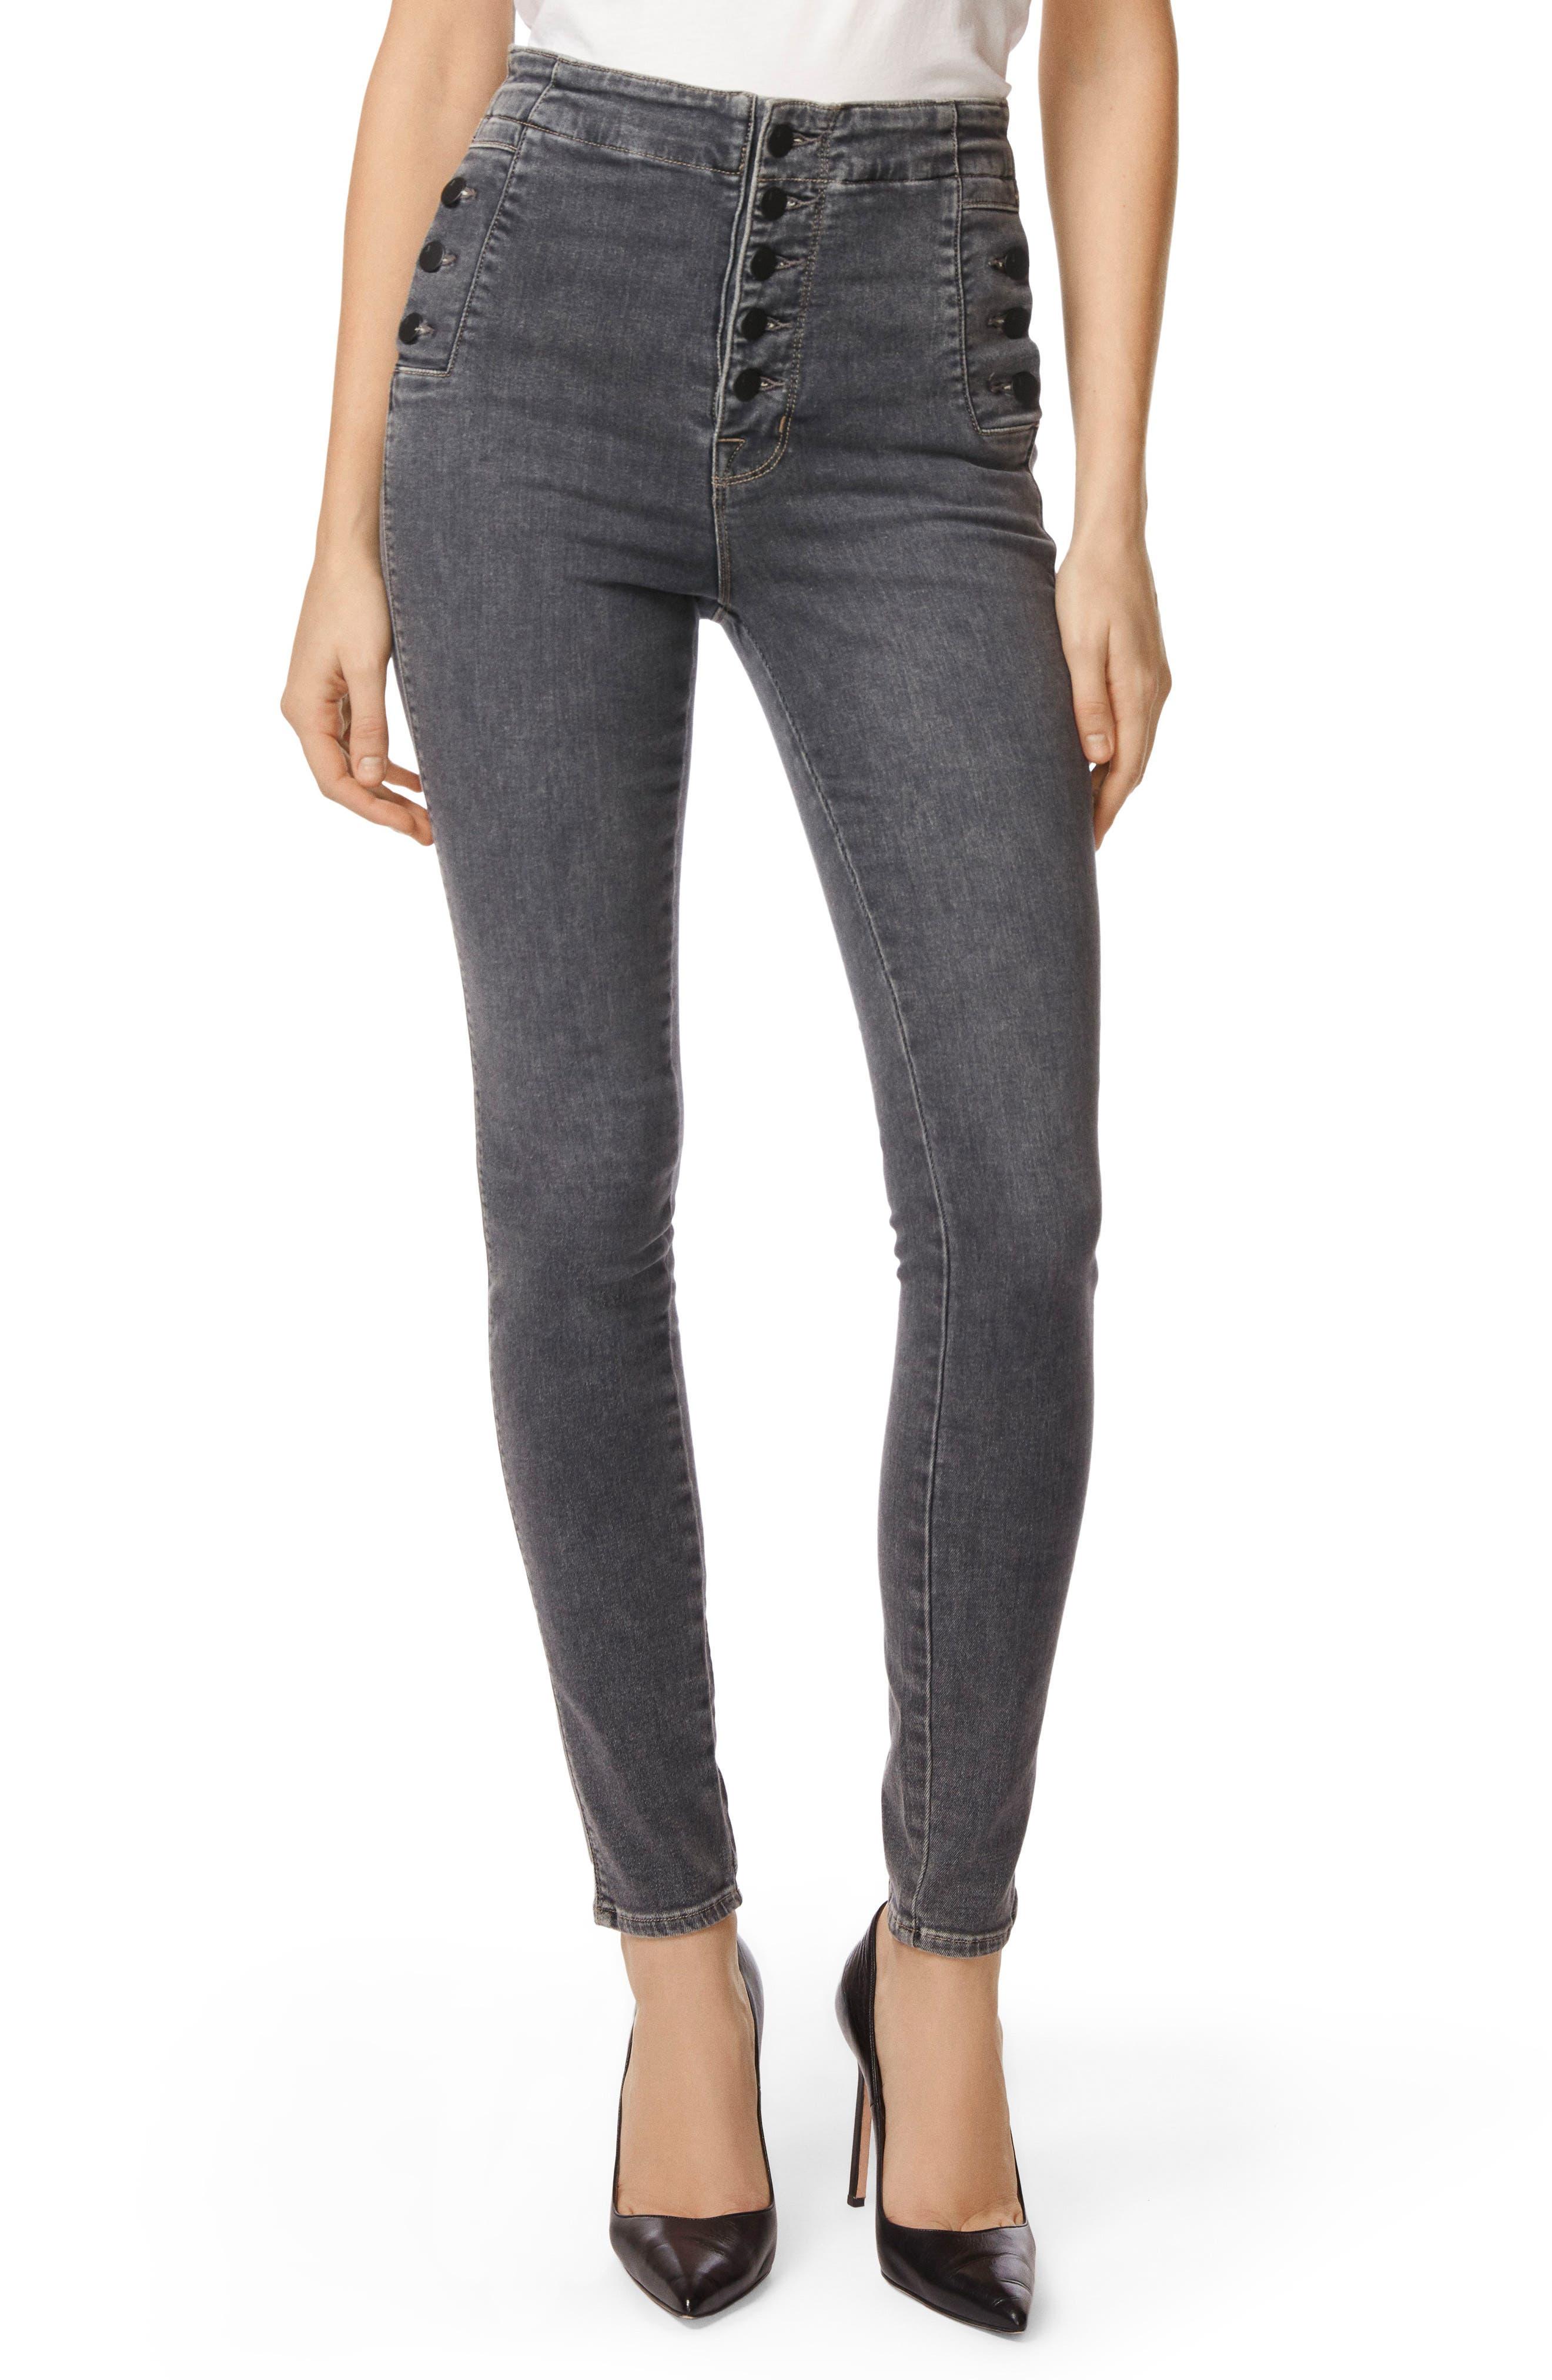 Natasha Sky High High Waist Super Skinny Jeans,                             Main thumbnail 1, color,                             Obscura